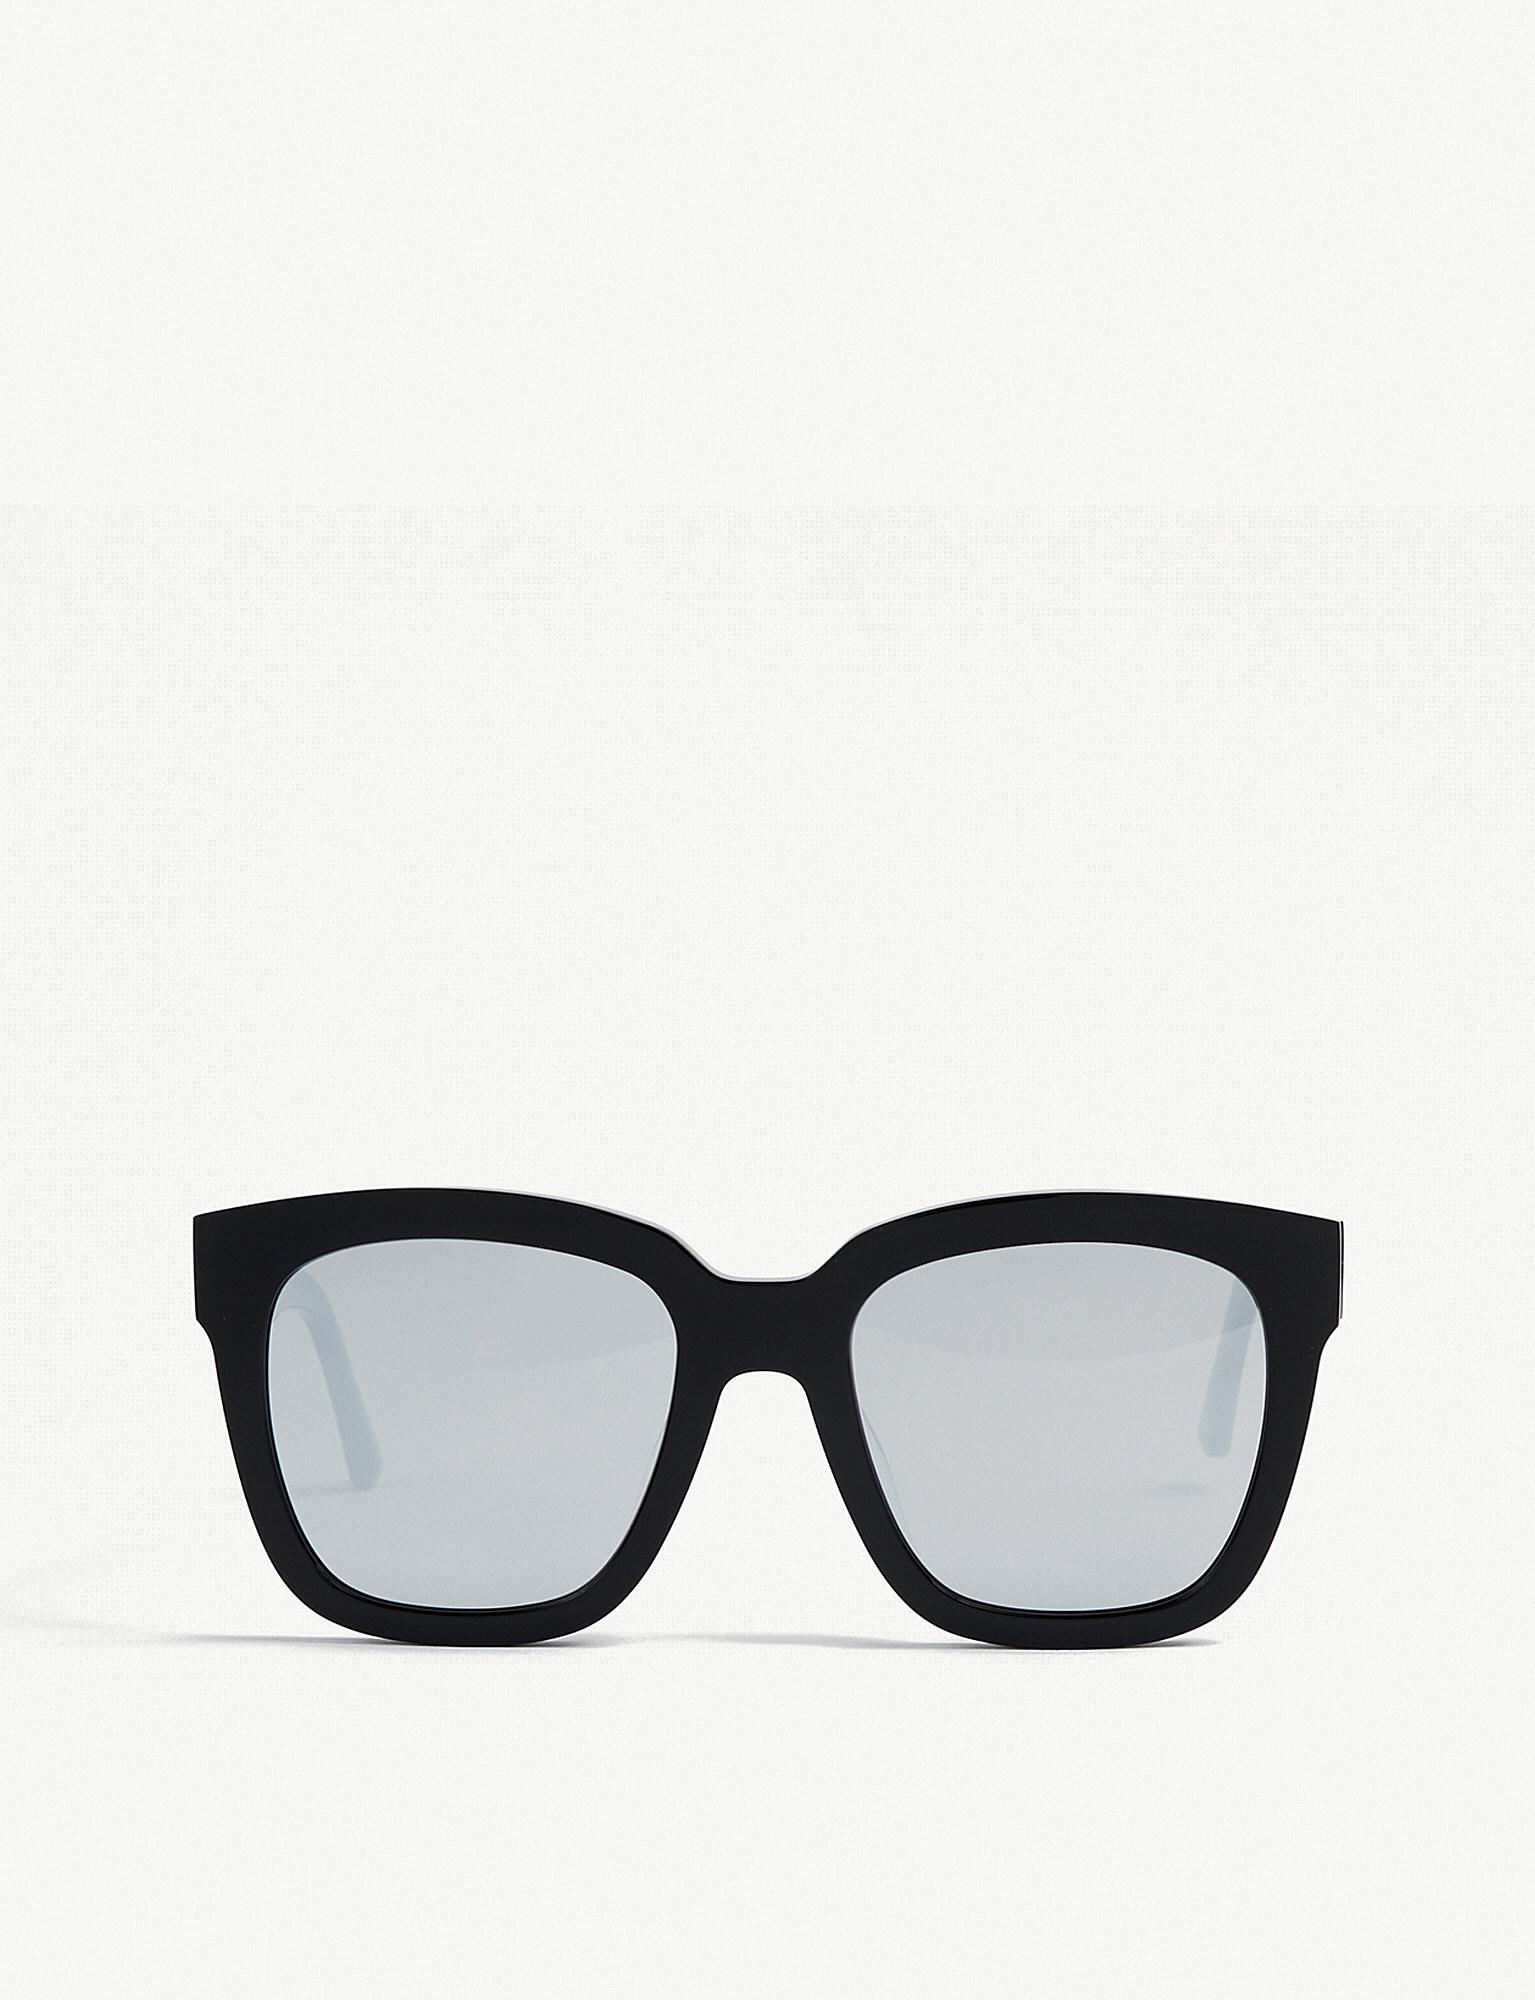 2d3dac0e862 Lyst - Gentle Monster Dreamer Hoff Mirrored Acetate Sunglasses in Black